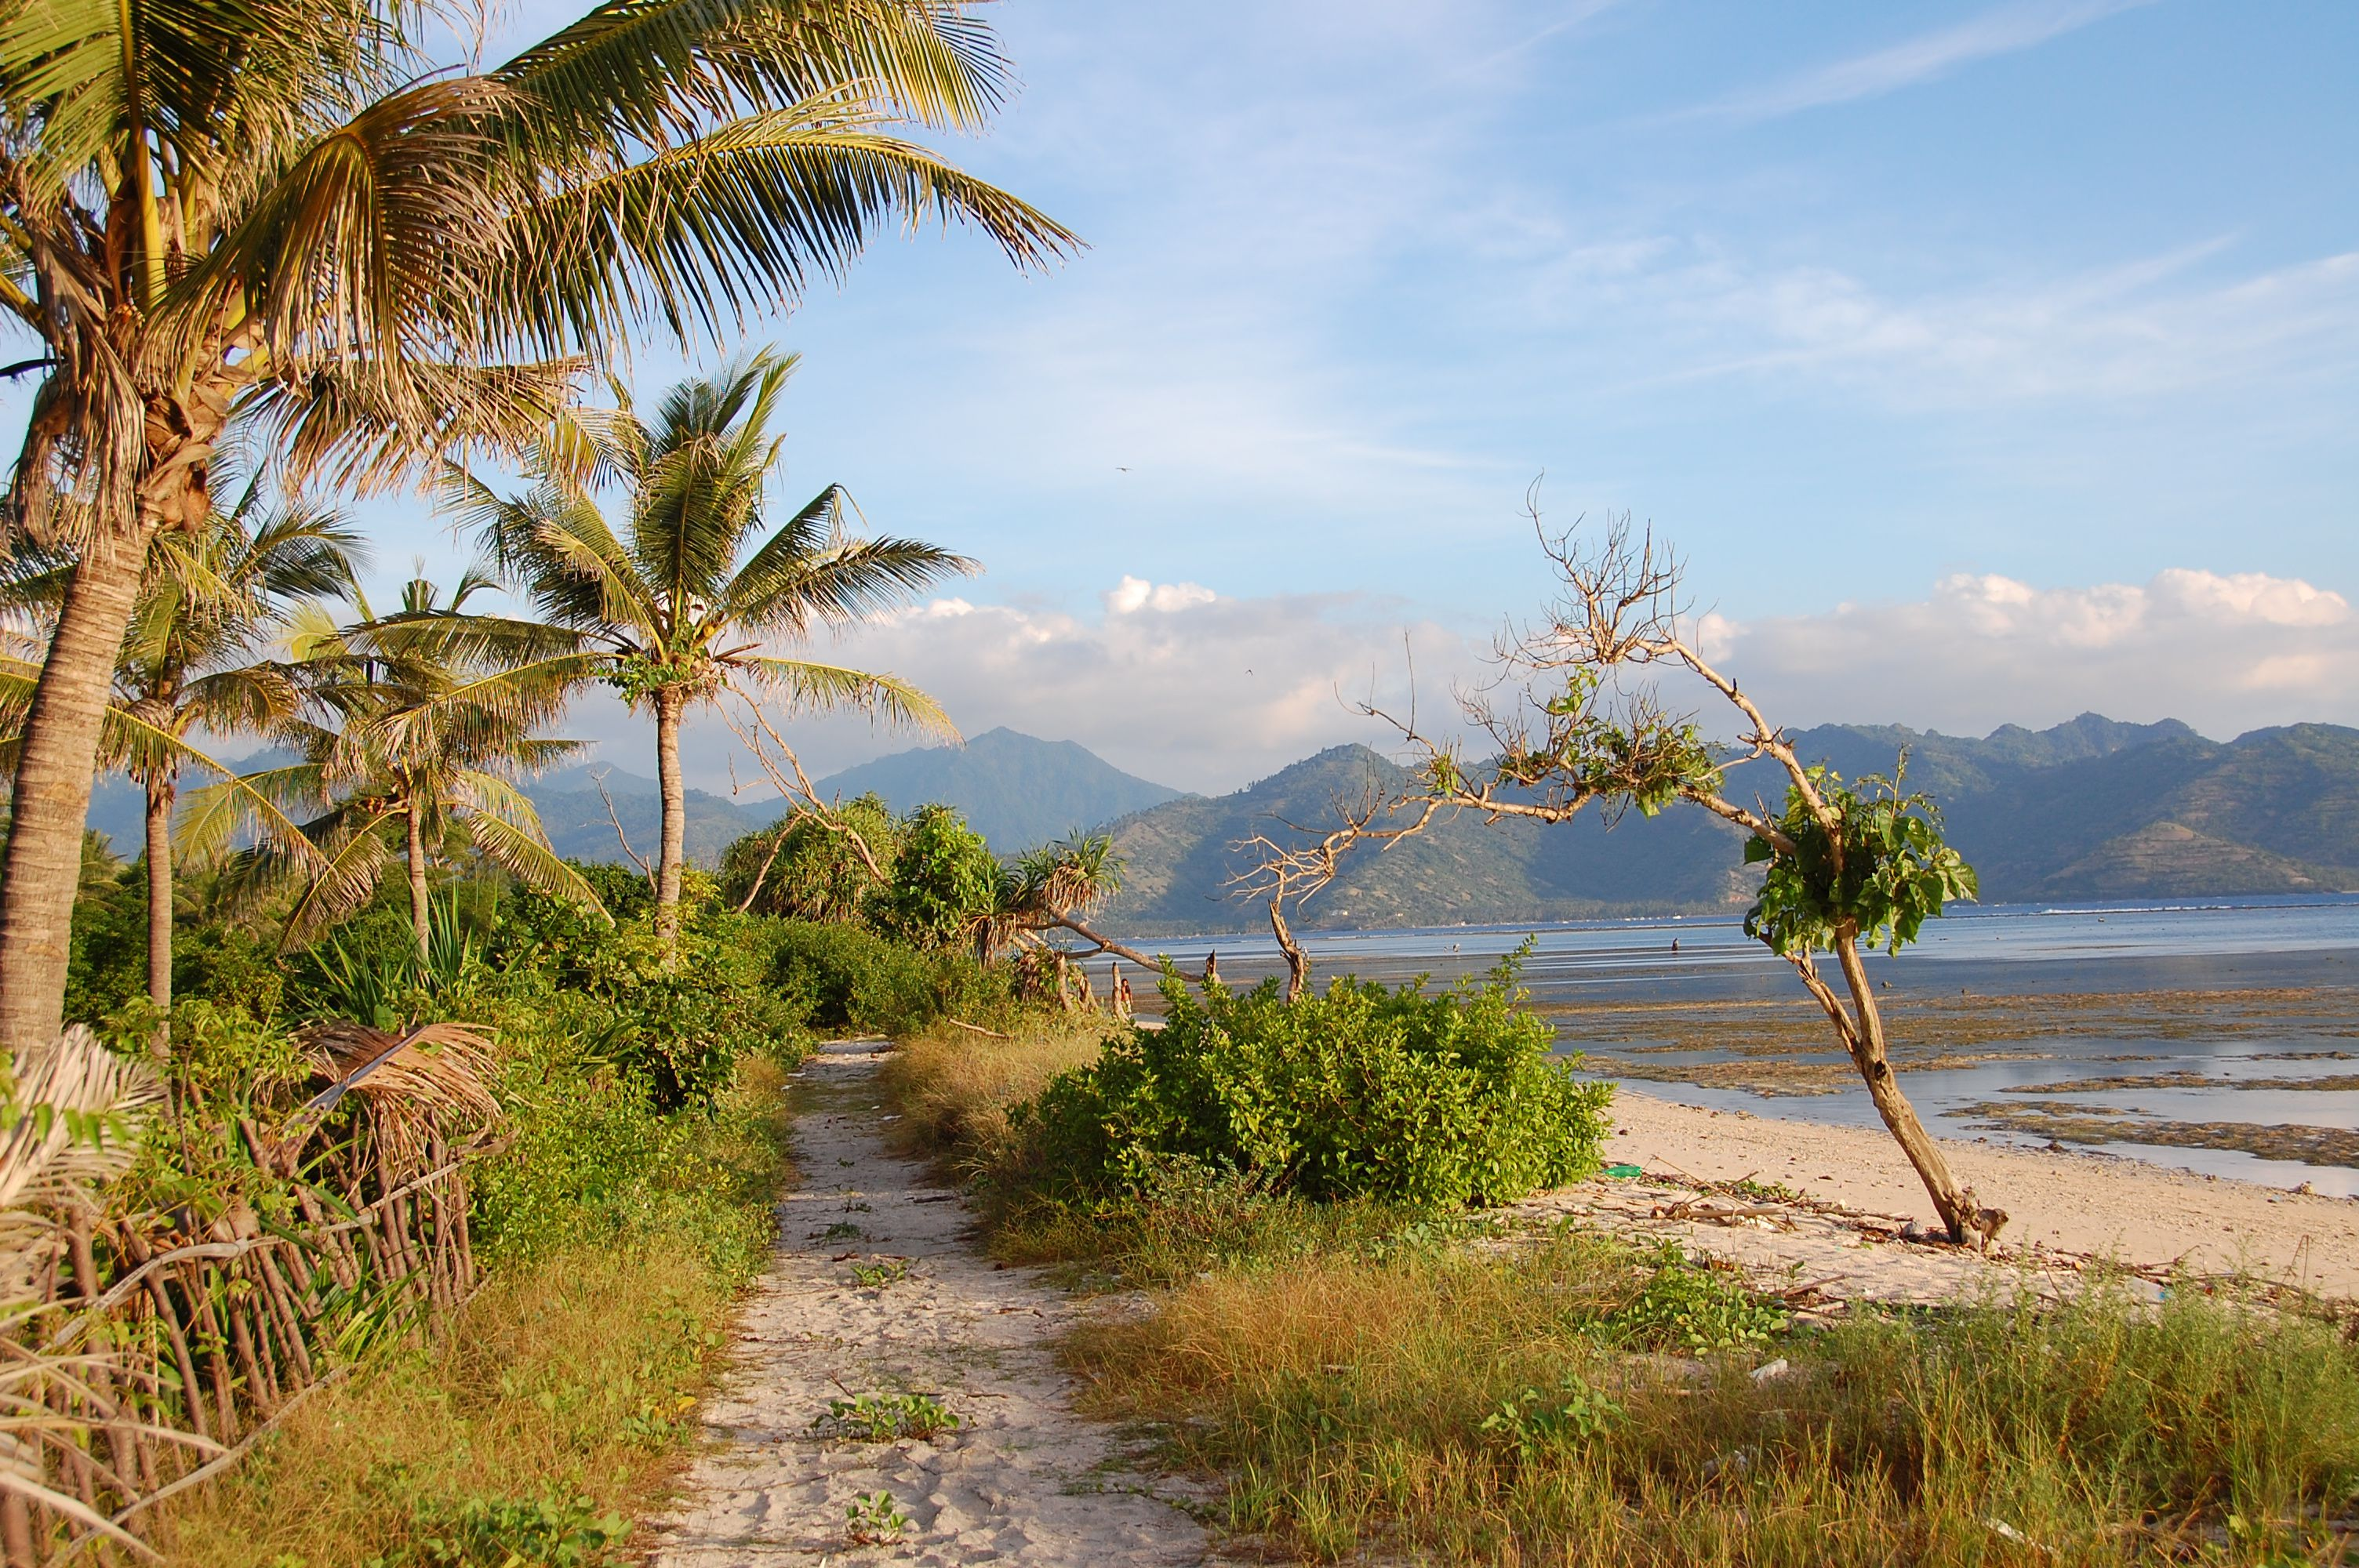 Path around Gili Air, Indonesia